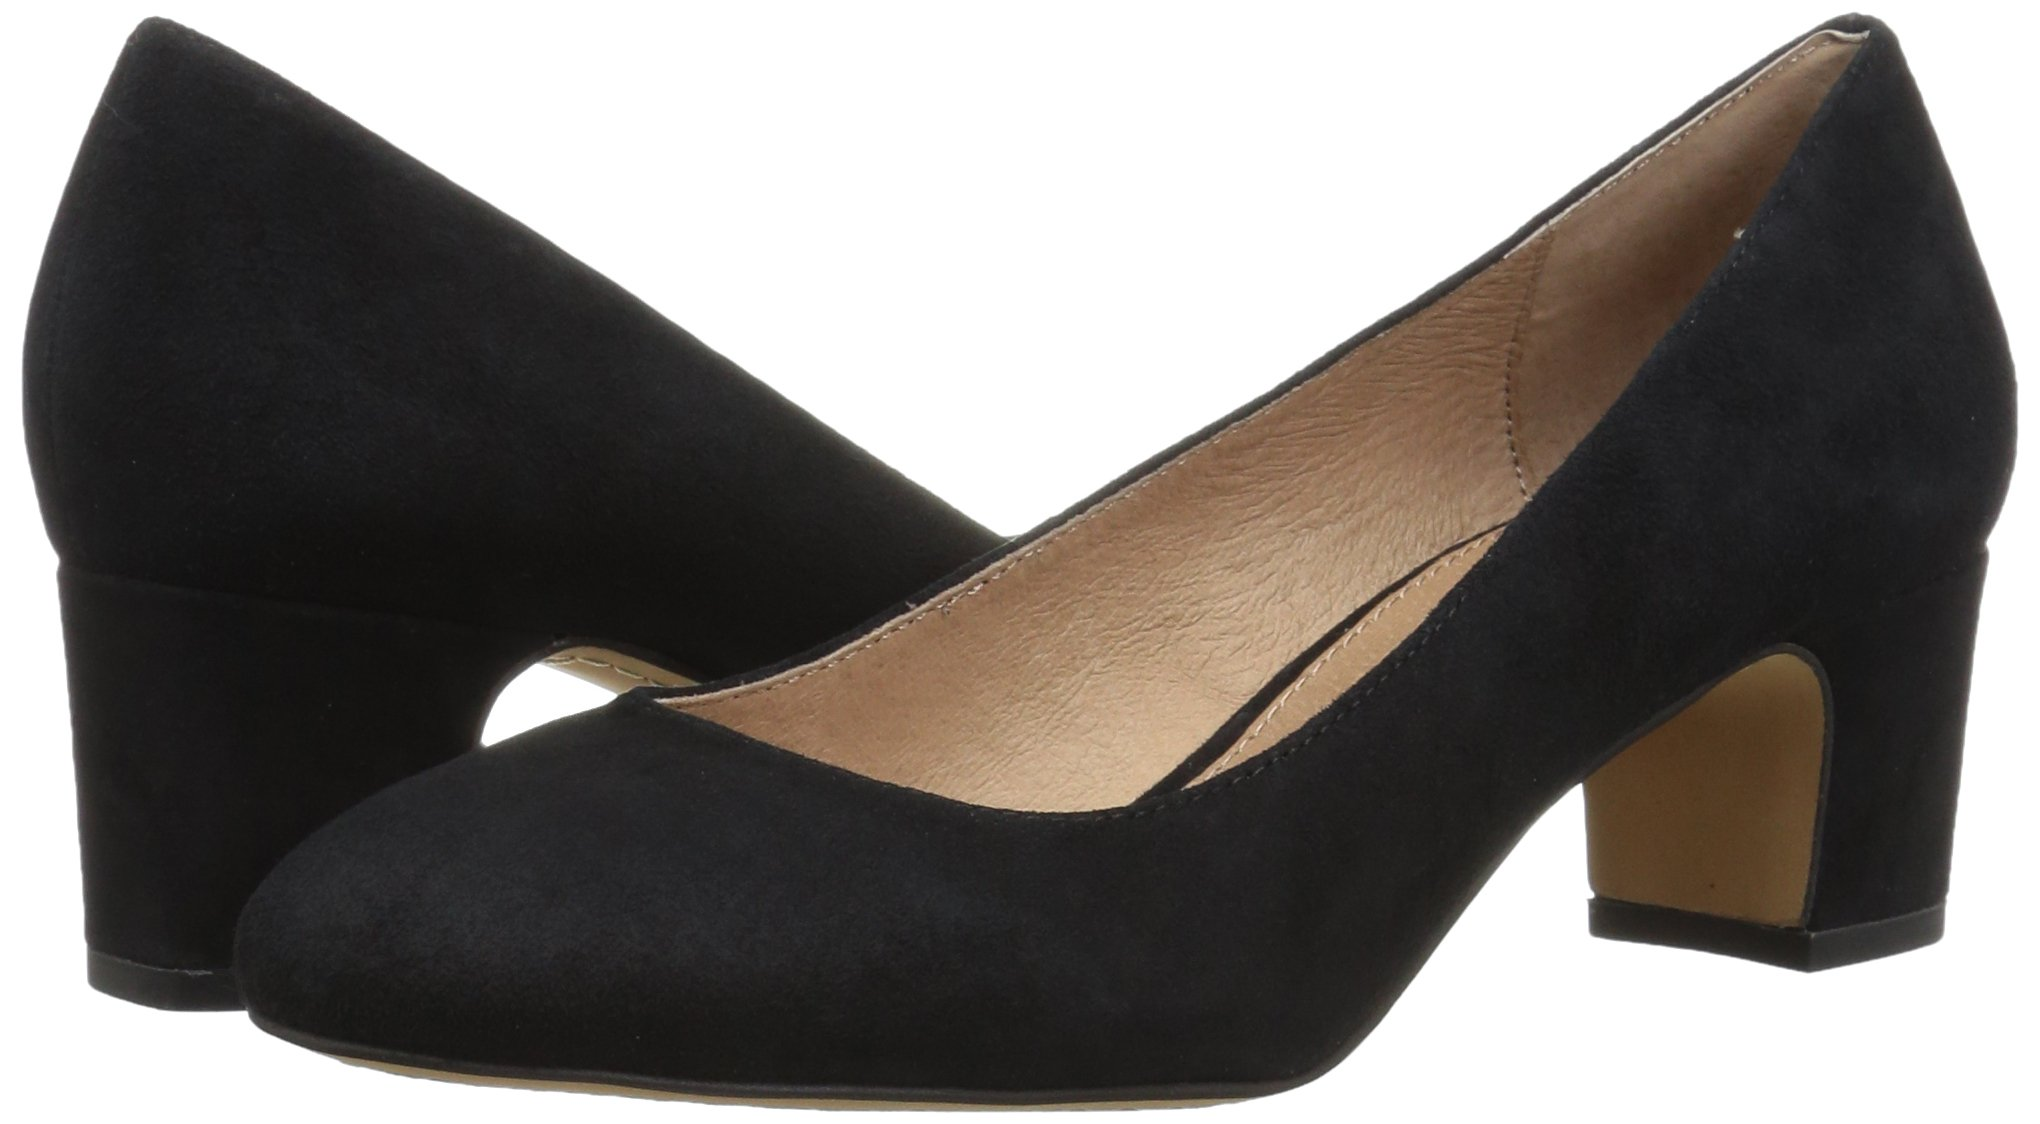 206 Collective Women's Merritt Round Toe Block Heel Low Pump, Black Suede, 7.5 B US by 206 Collective (Image #5)